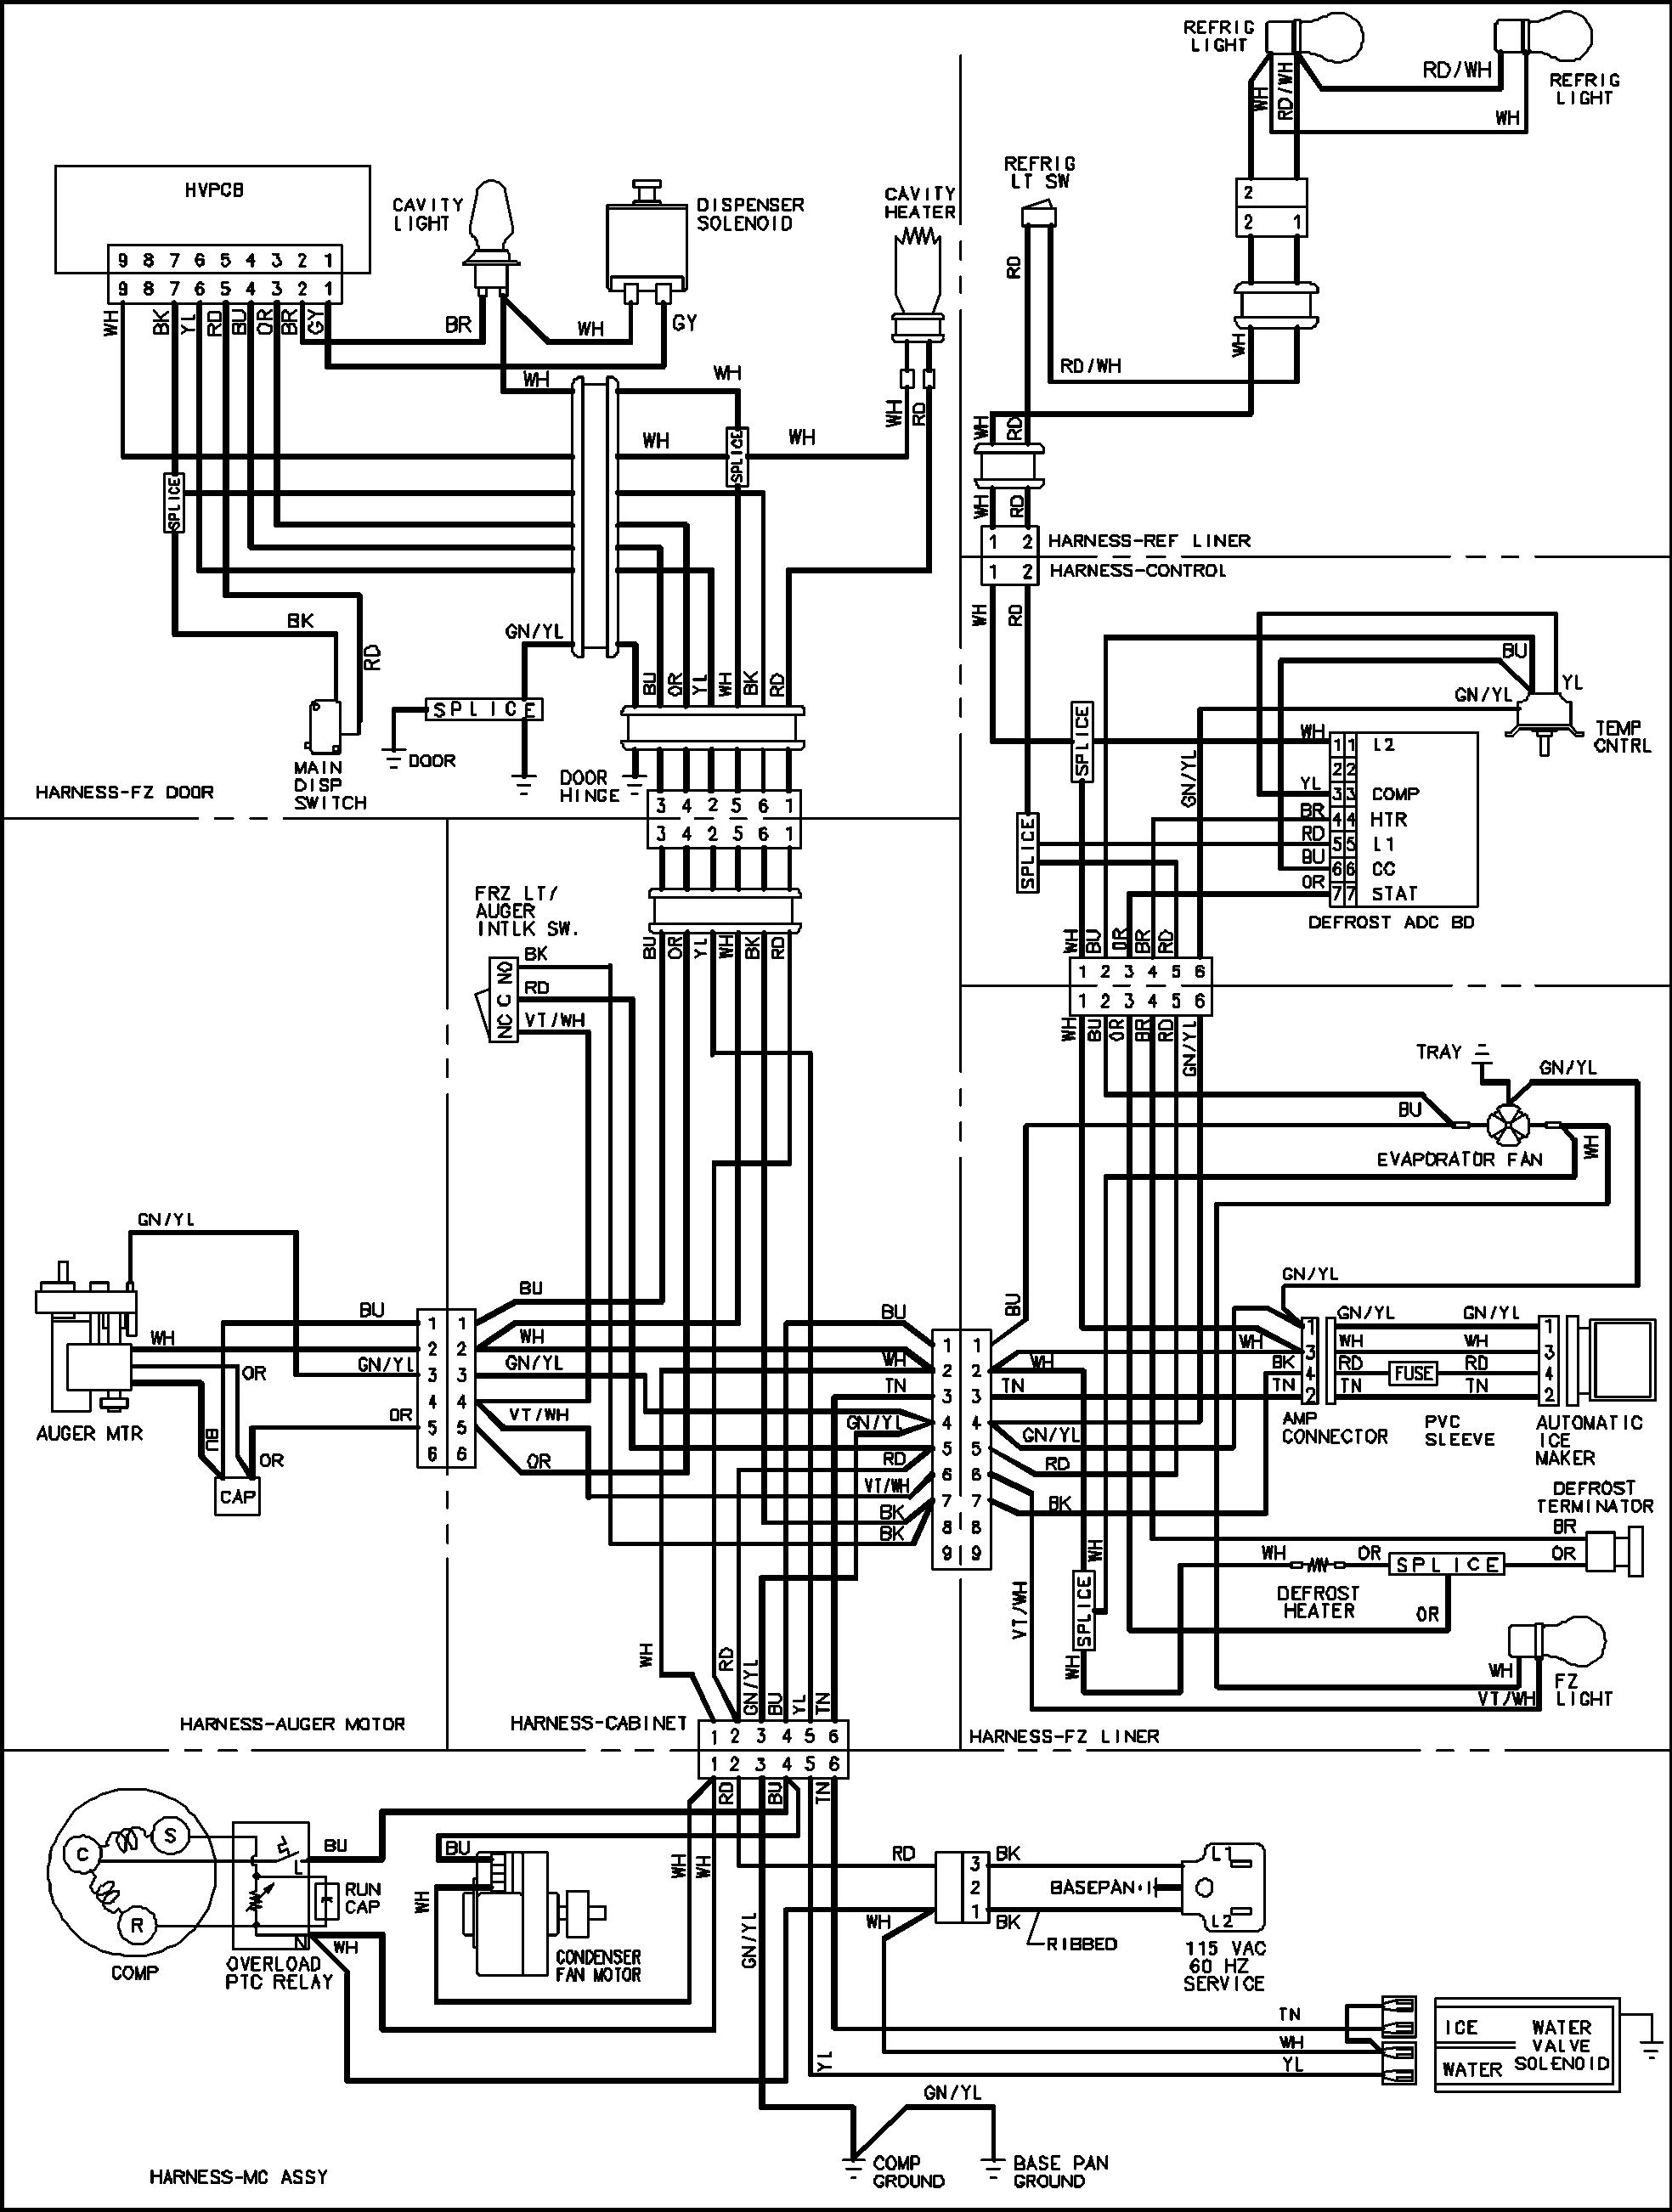 Groovy Simple Refrigerator Wiring Diagram Basic Electronics Wiring Diagram Wiring Cloud Domeilariaidewilluminateatxorg